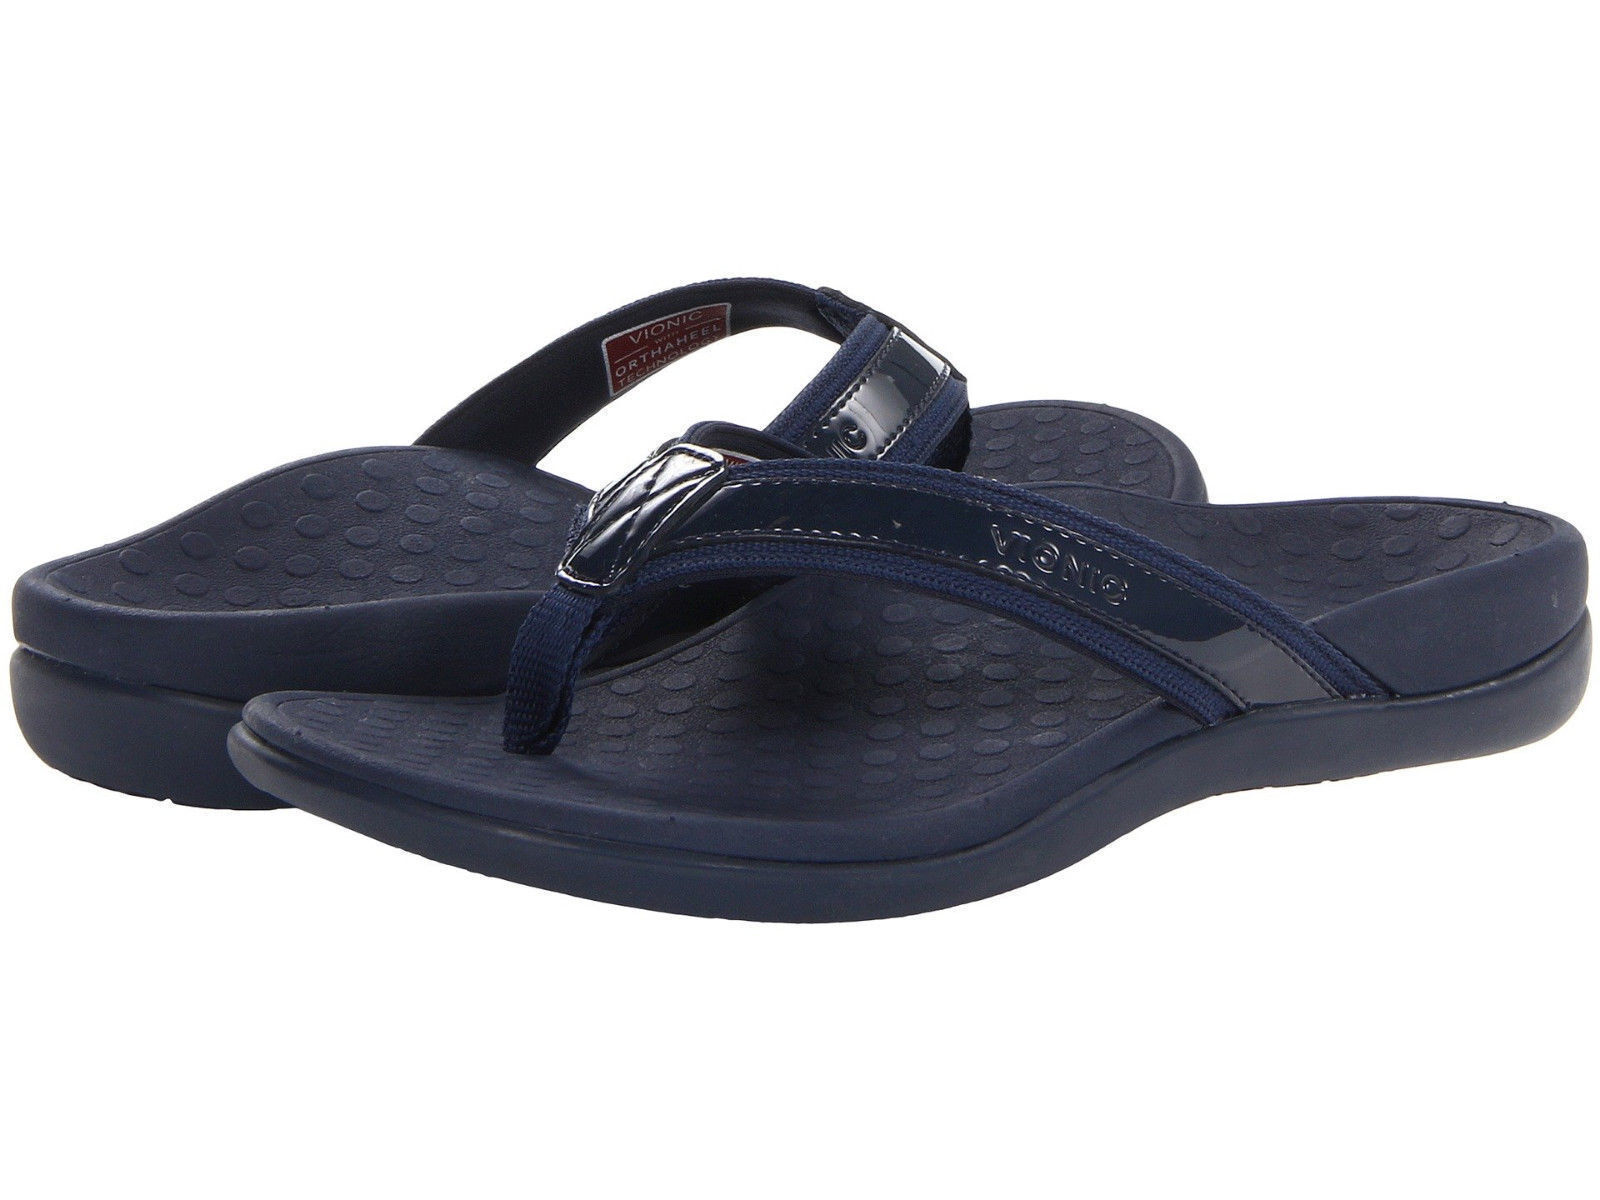 Damens Vionic Orthaheel Tide II Flip Flop Sandale 44TIDEII Navy 100% Original New